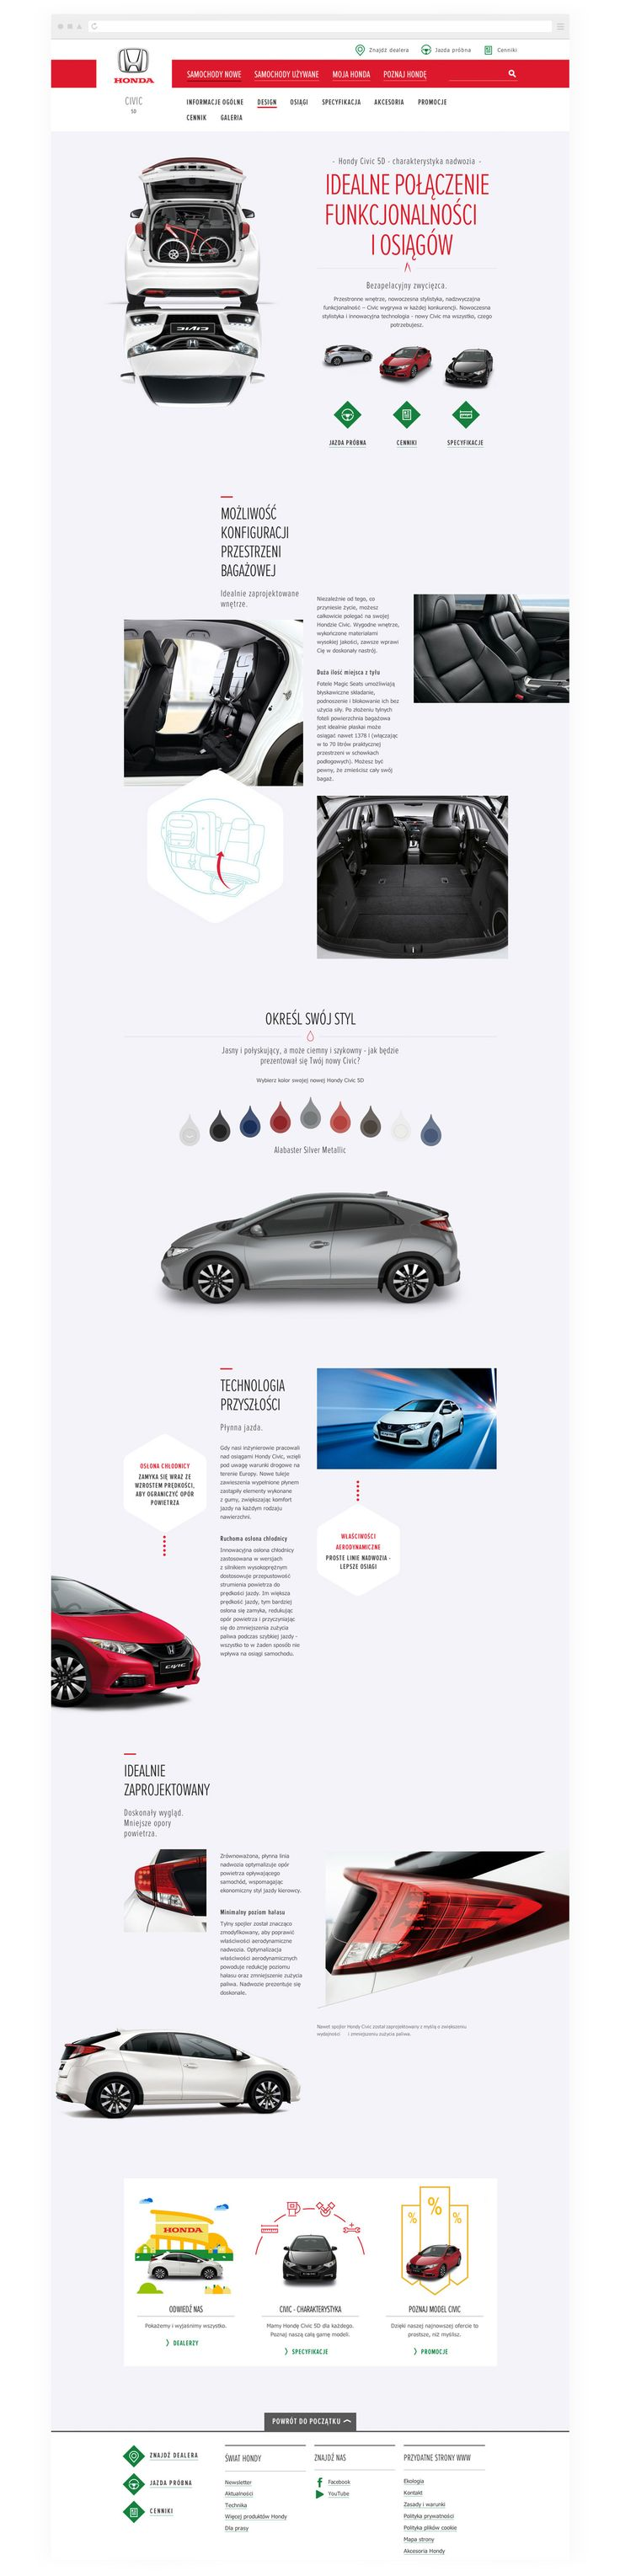 Honda Europe - Website & Art Direction